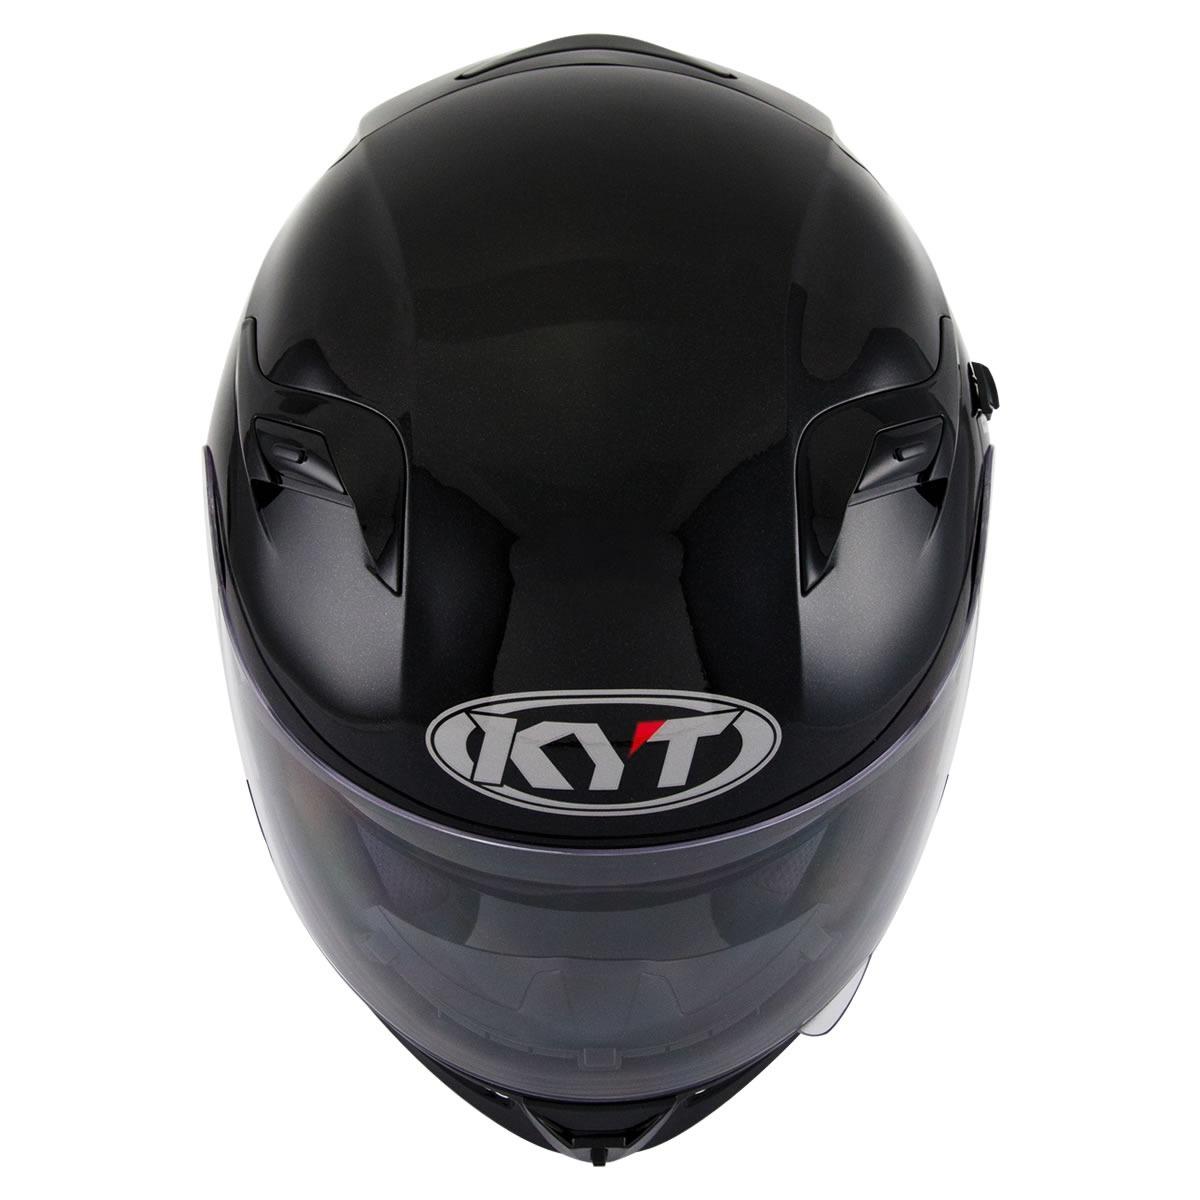 2963ed4d casco moto kyt sv negro brillo visor interno sol motoscba. Cargando zoom.